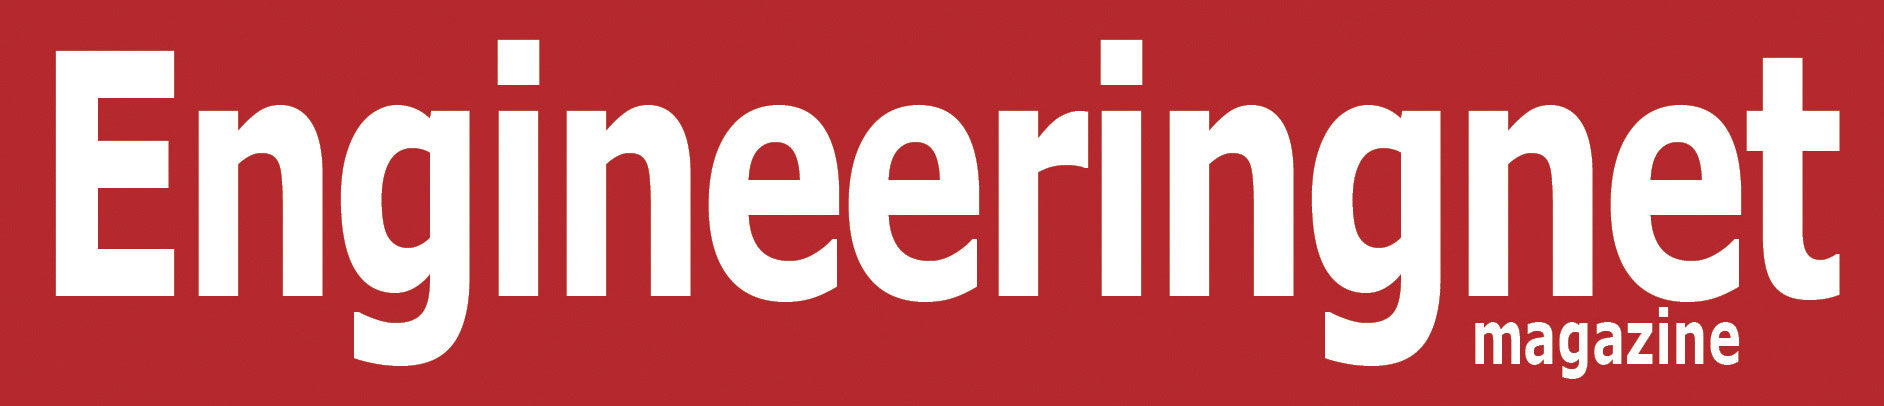 Engineering Net Magazine